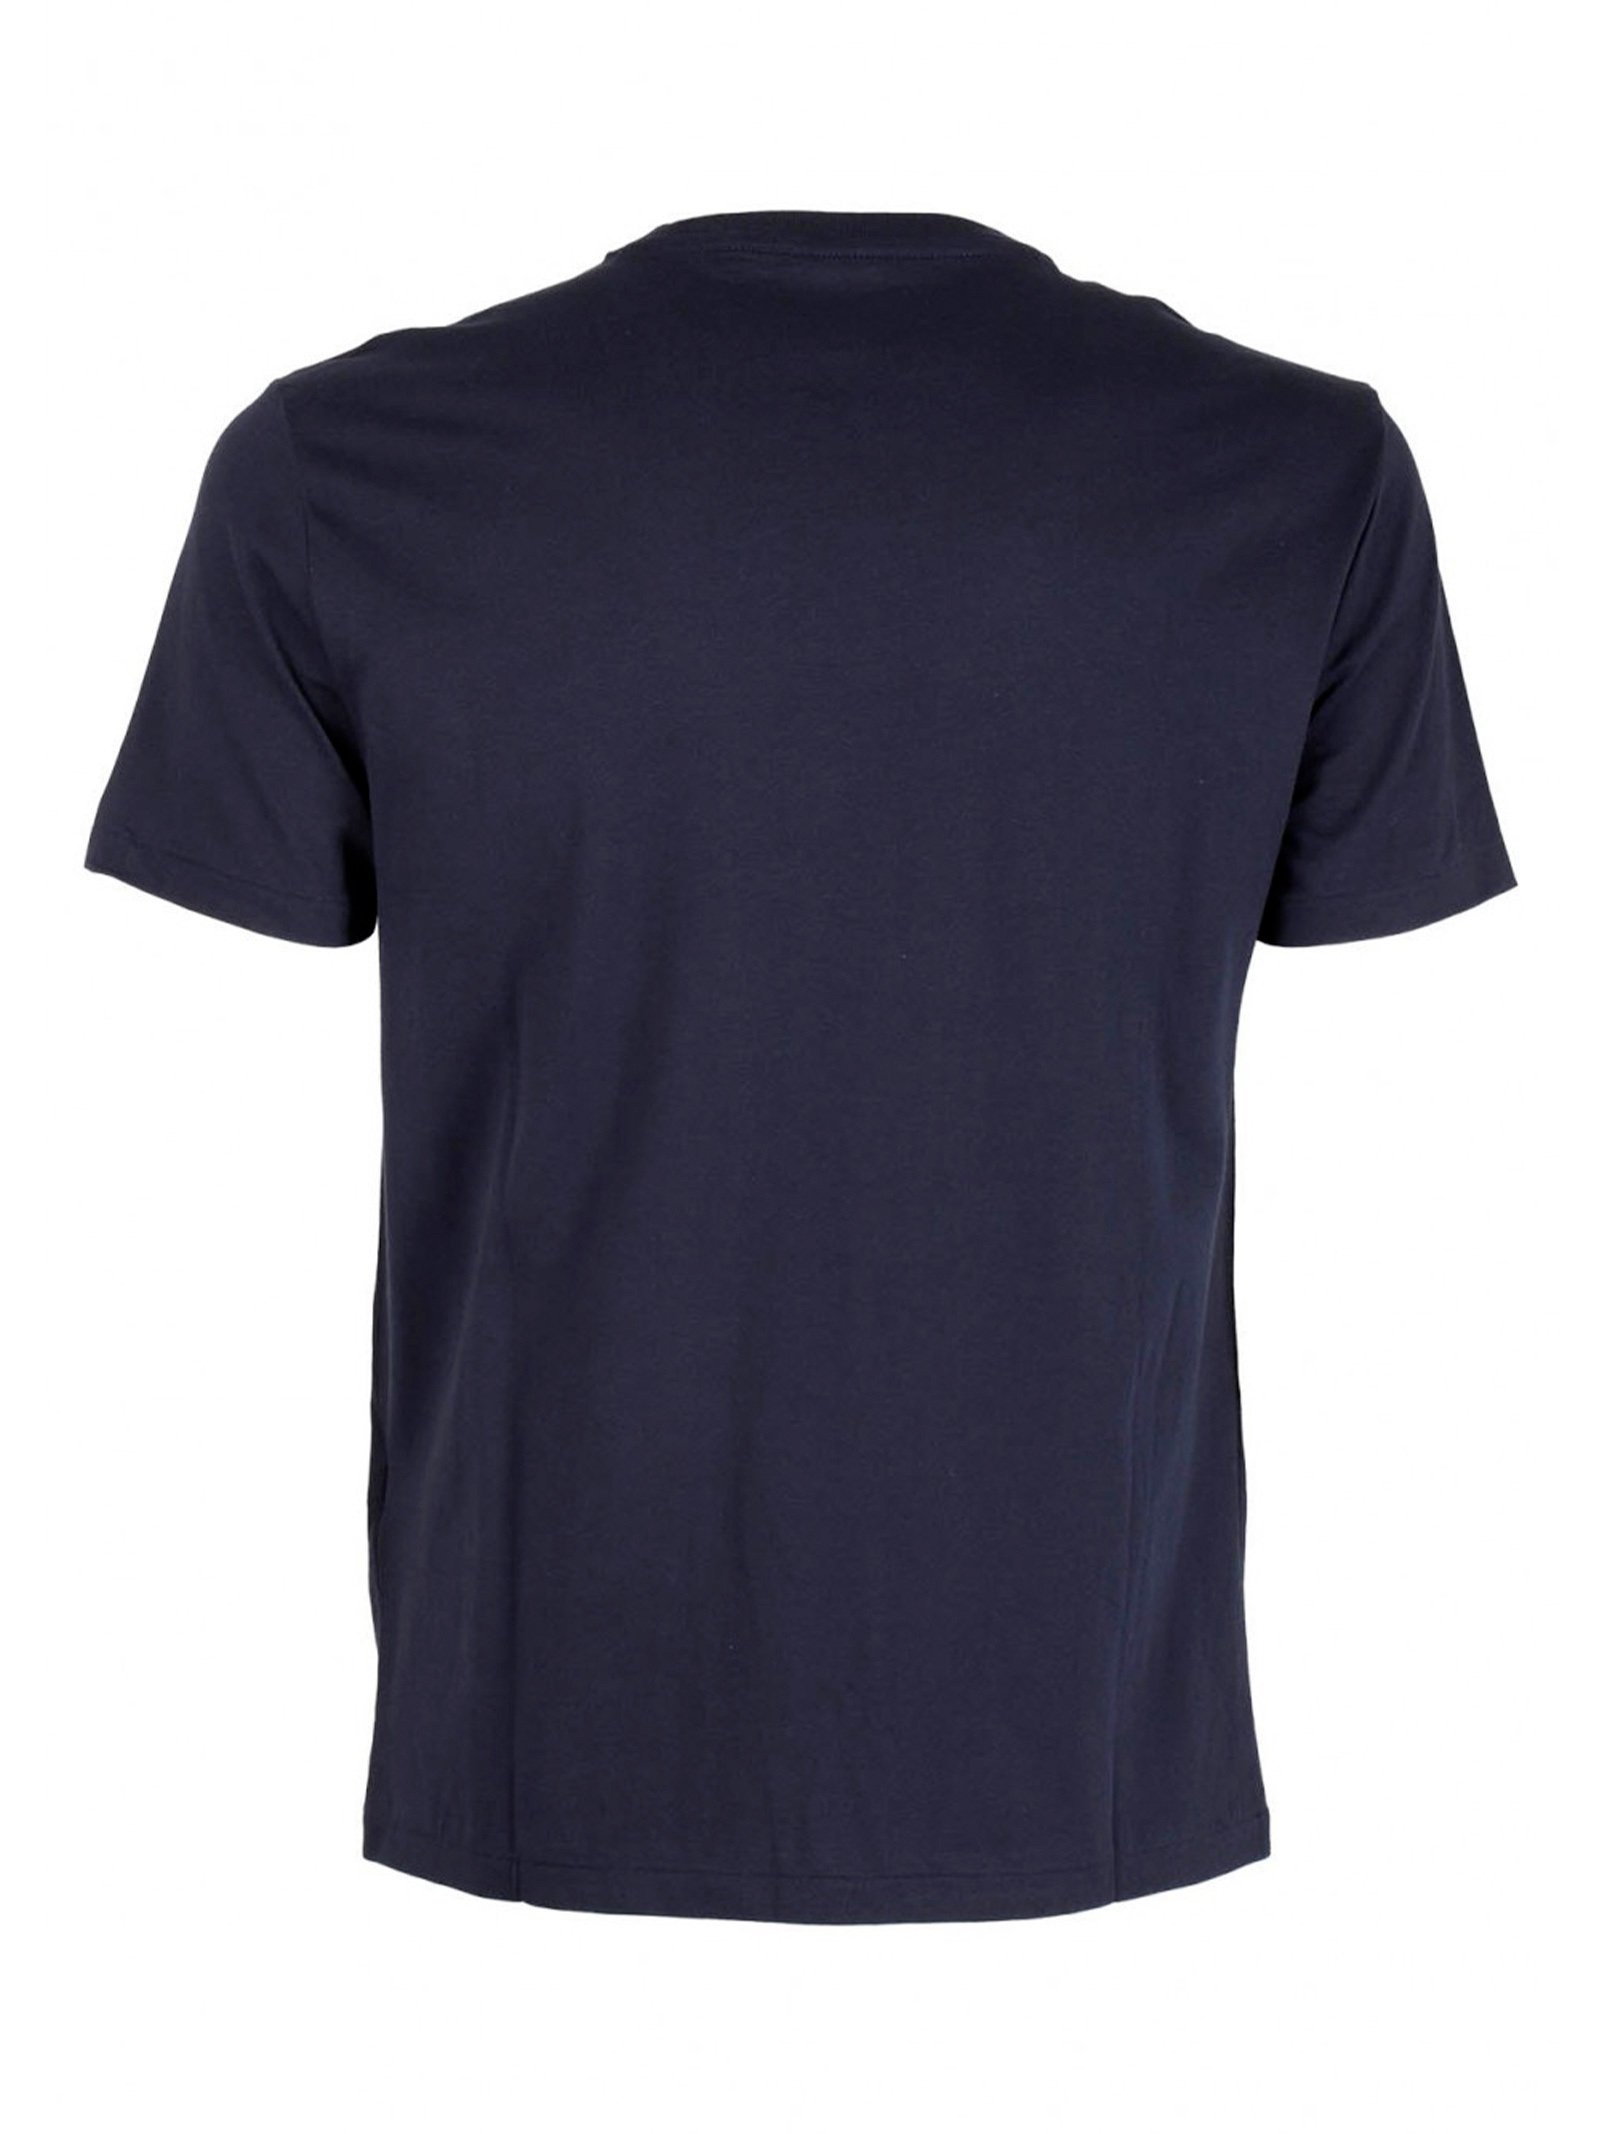 T-shirt girocollo con logo RALPH LAUREN | T-shirt | 710-680785004